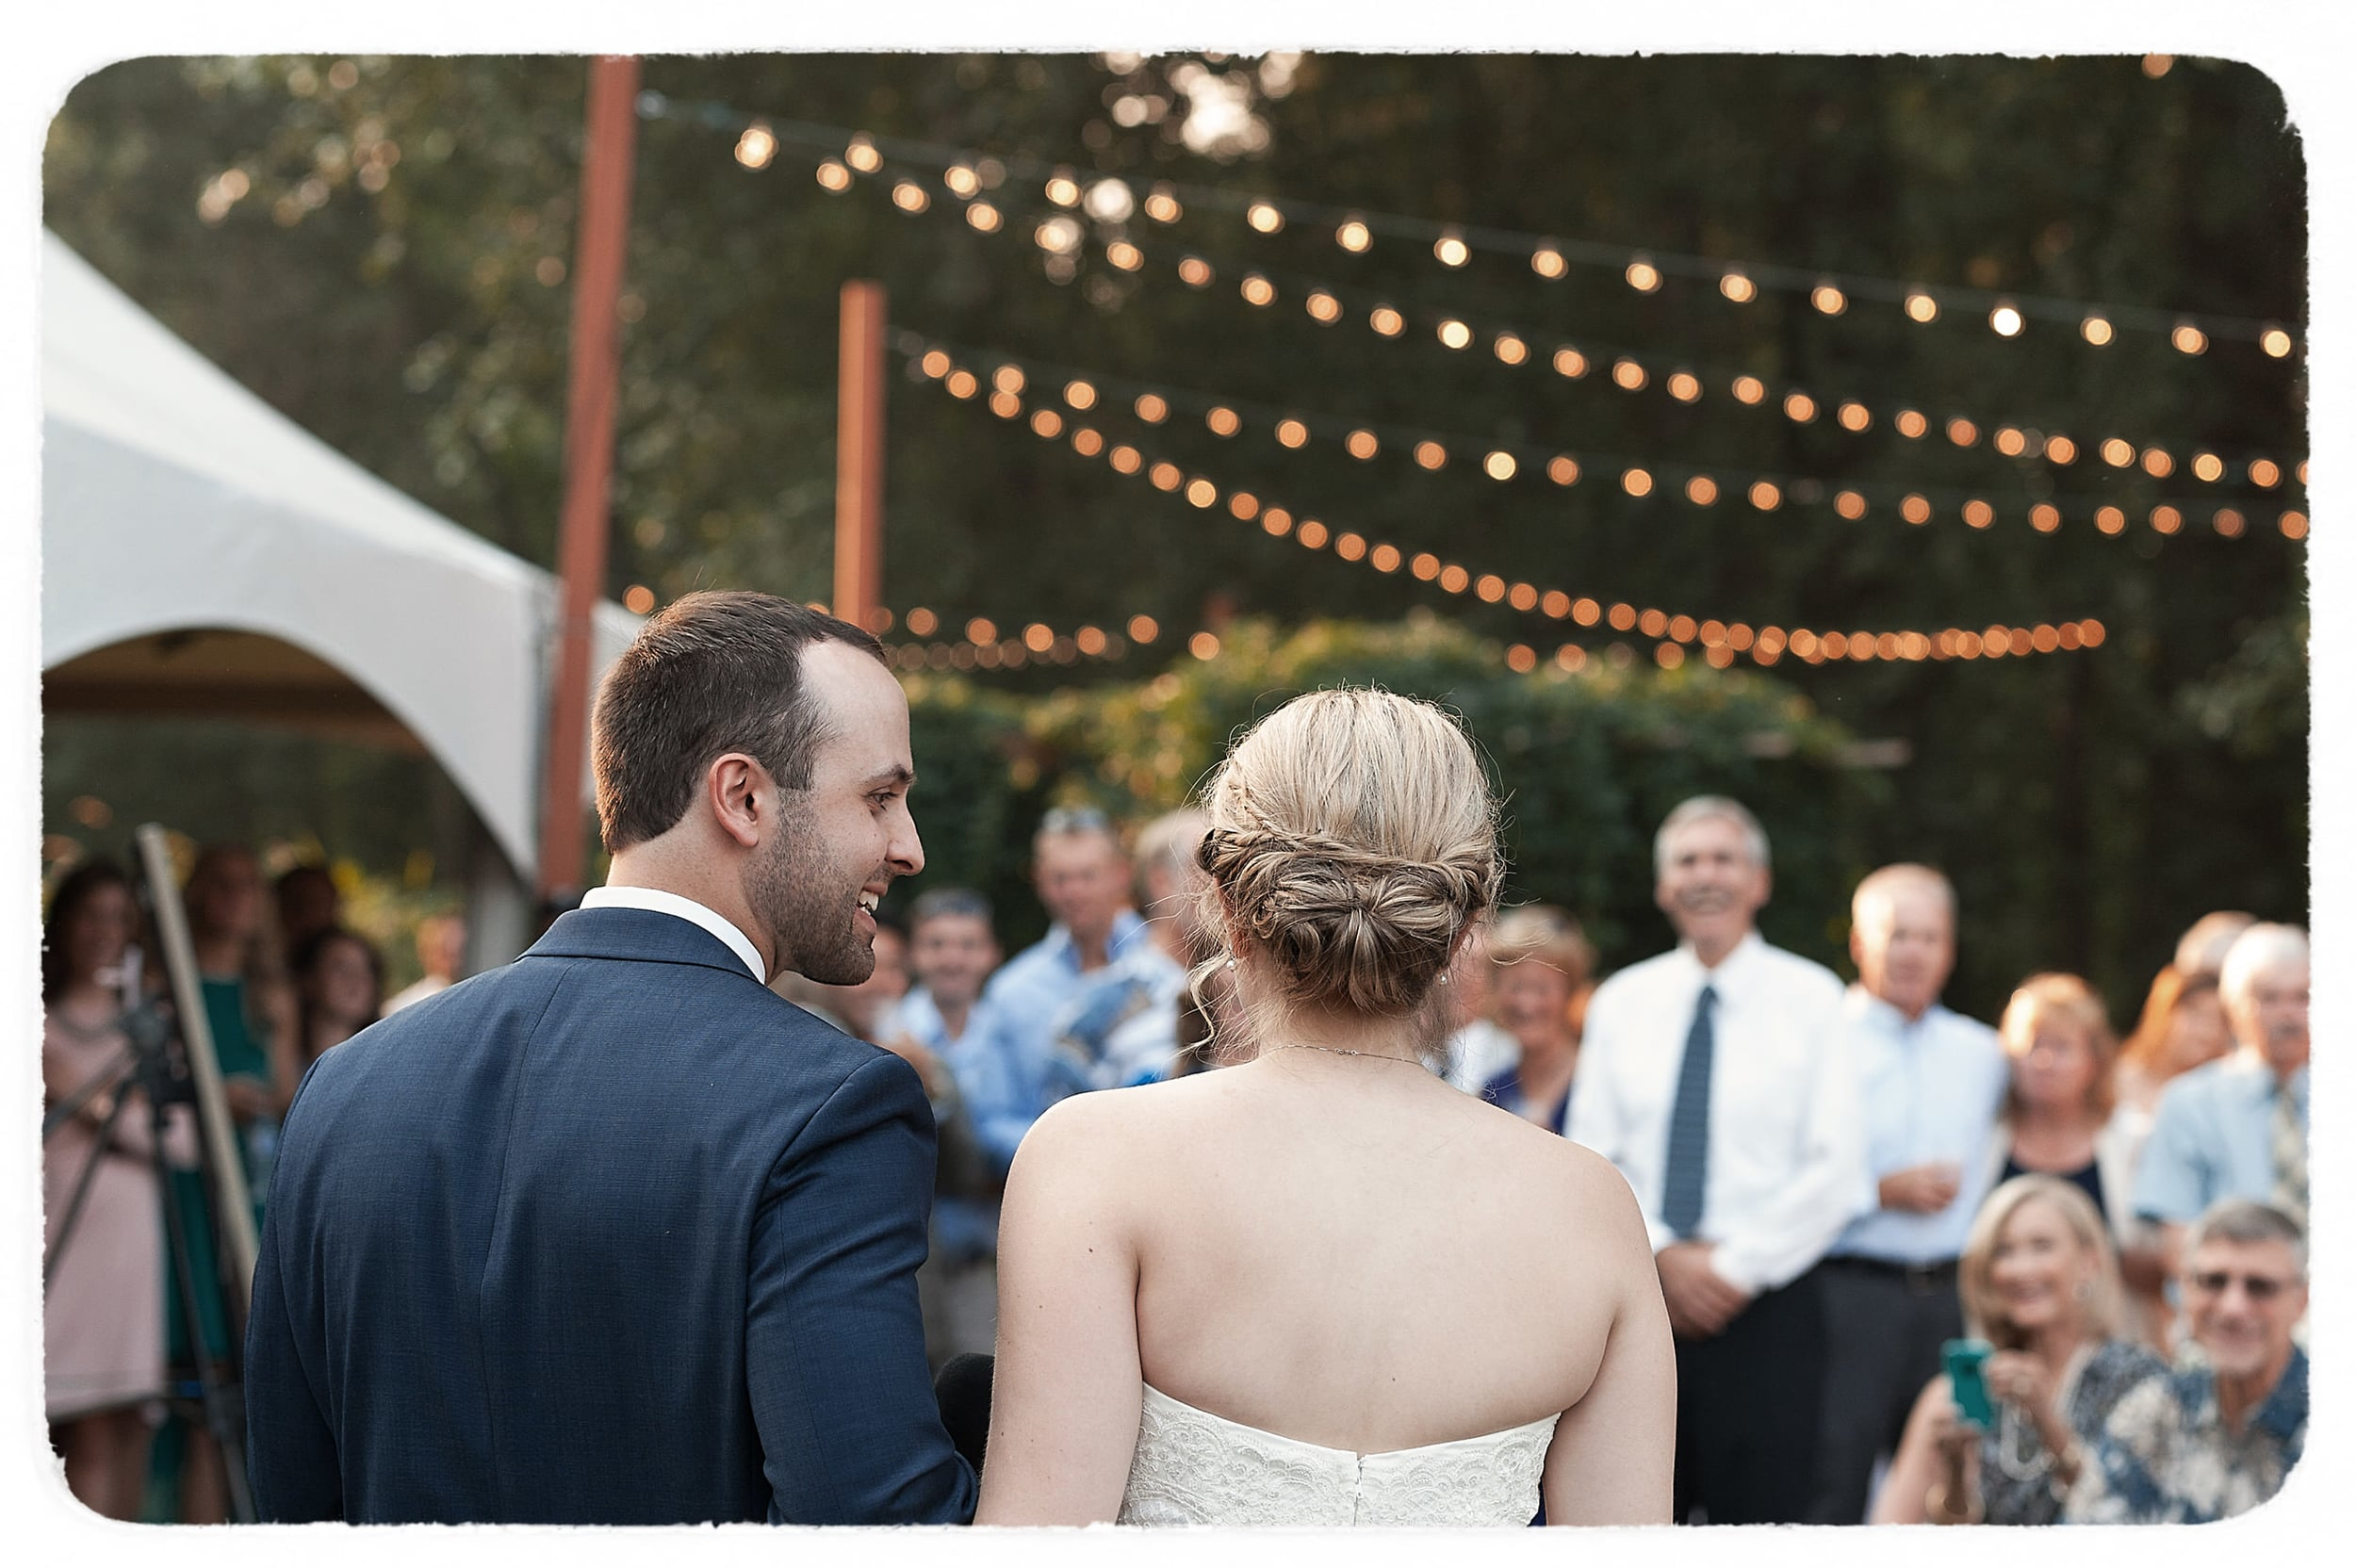 531 Kate&Marc-Wedding-OriginalCollection-531Film.jpg